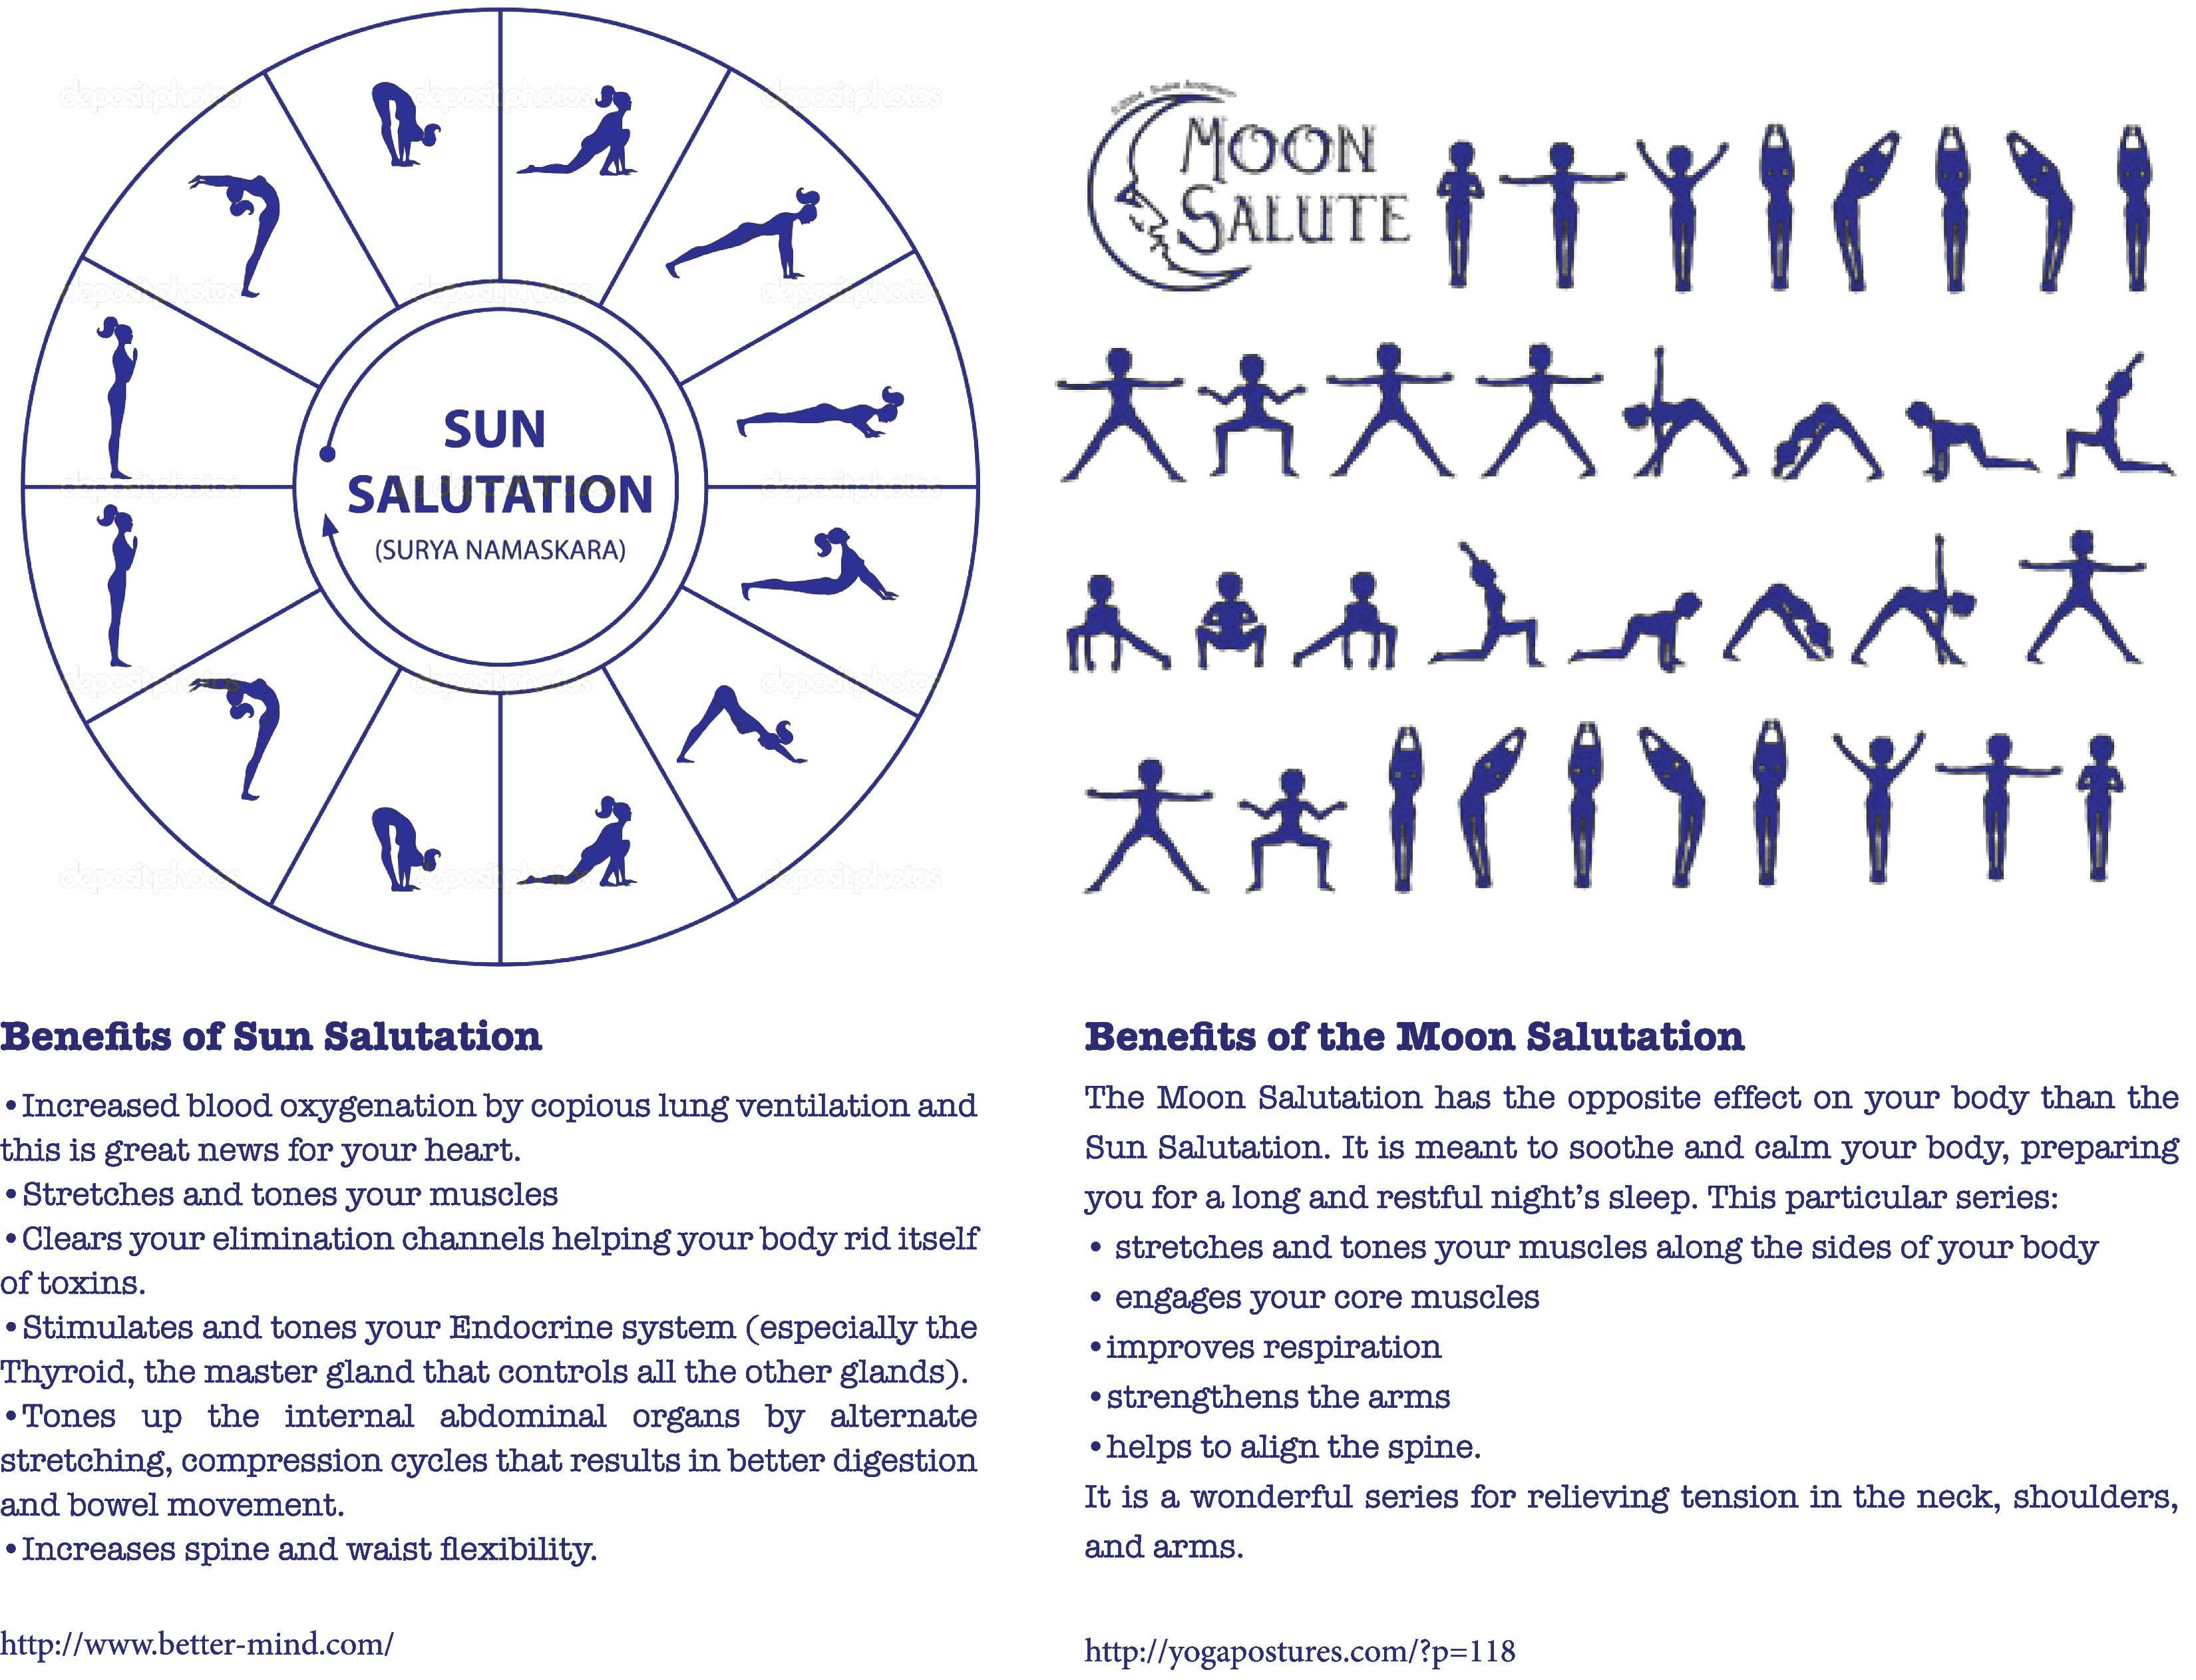 Sun and Moon Salutations | Vinyasa yoga poses, Moon ...